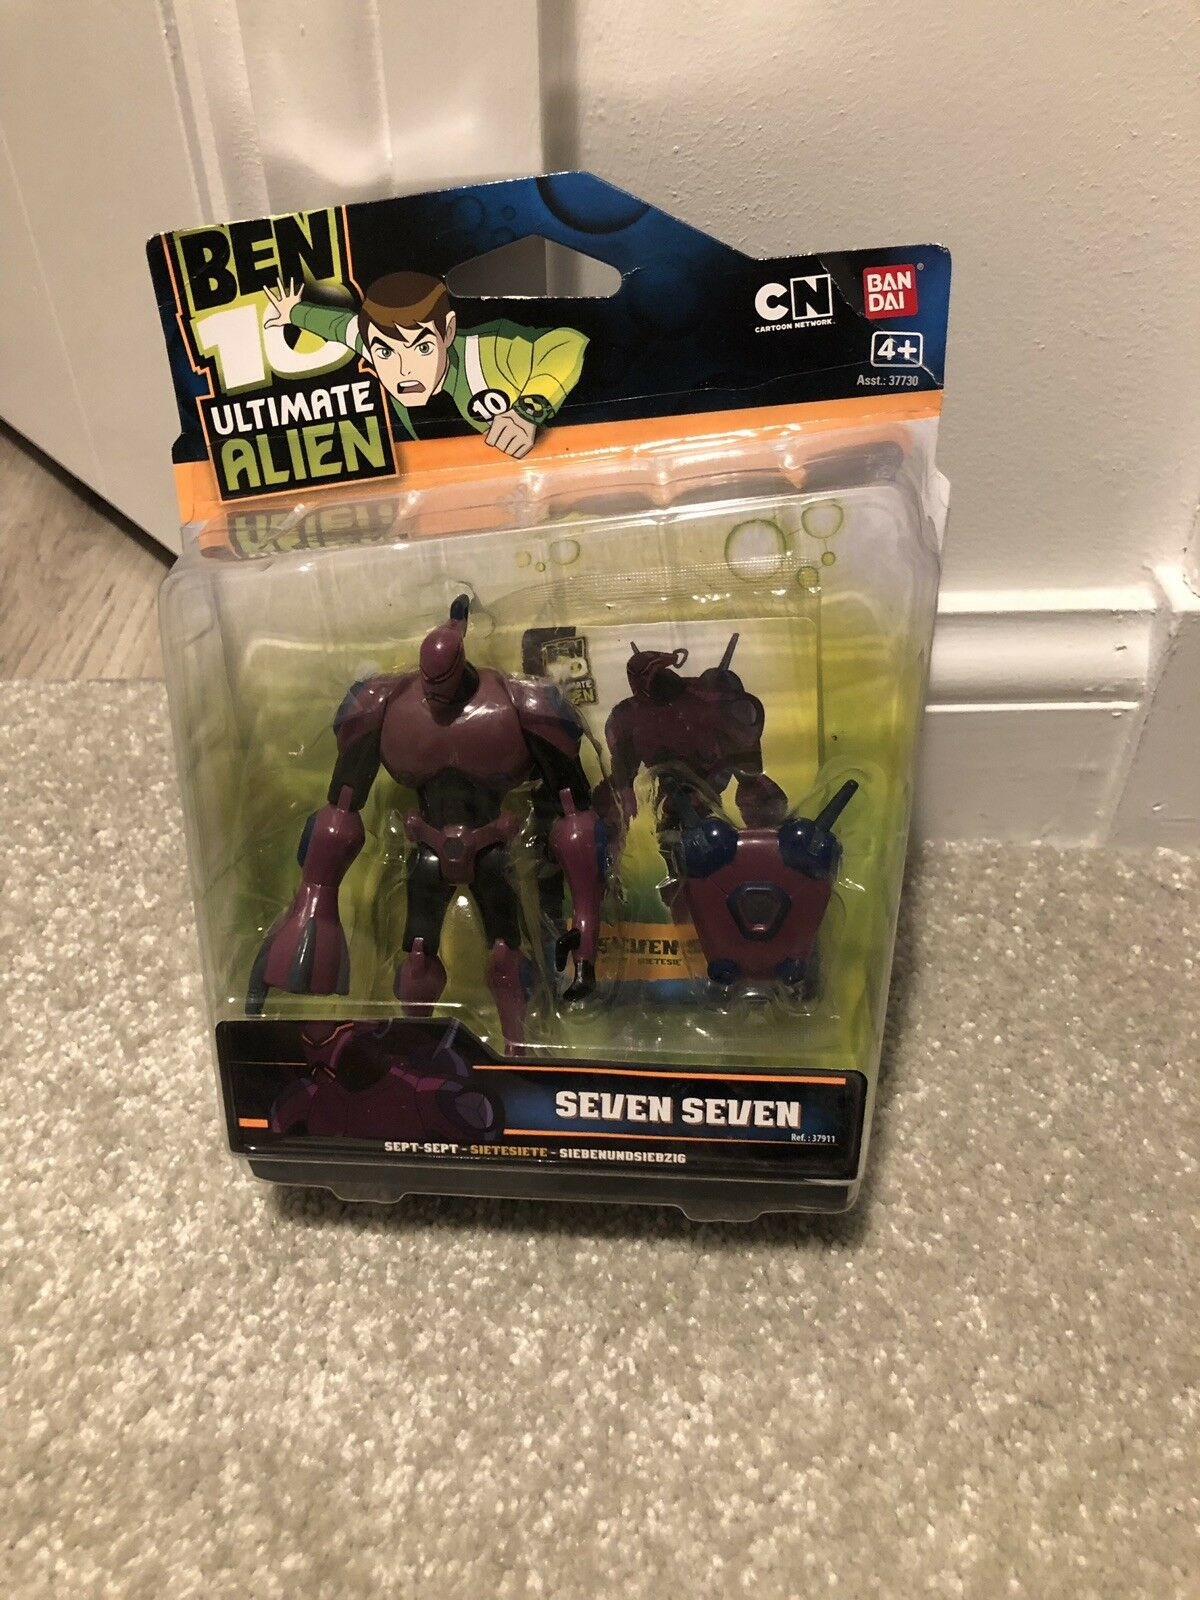 Ben 10 figur Sällsynt Sju Sju Ultimate Alien